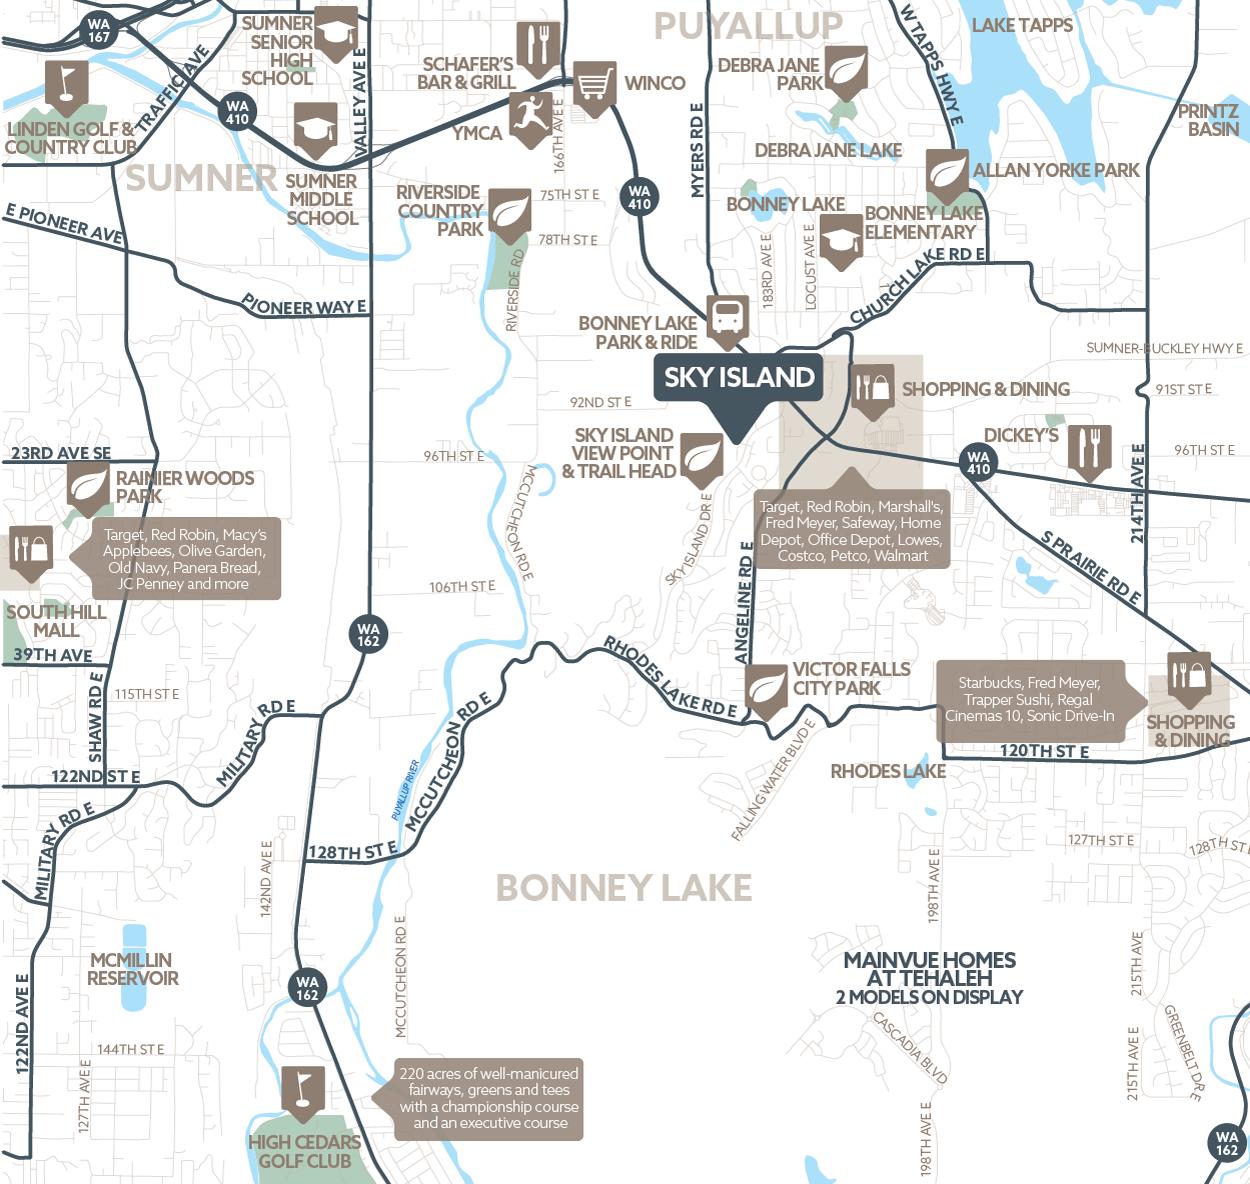 Sky Island amenity map